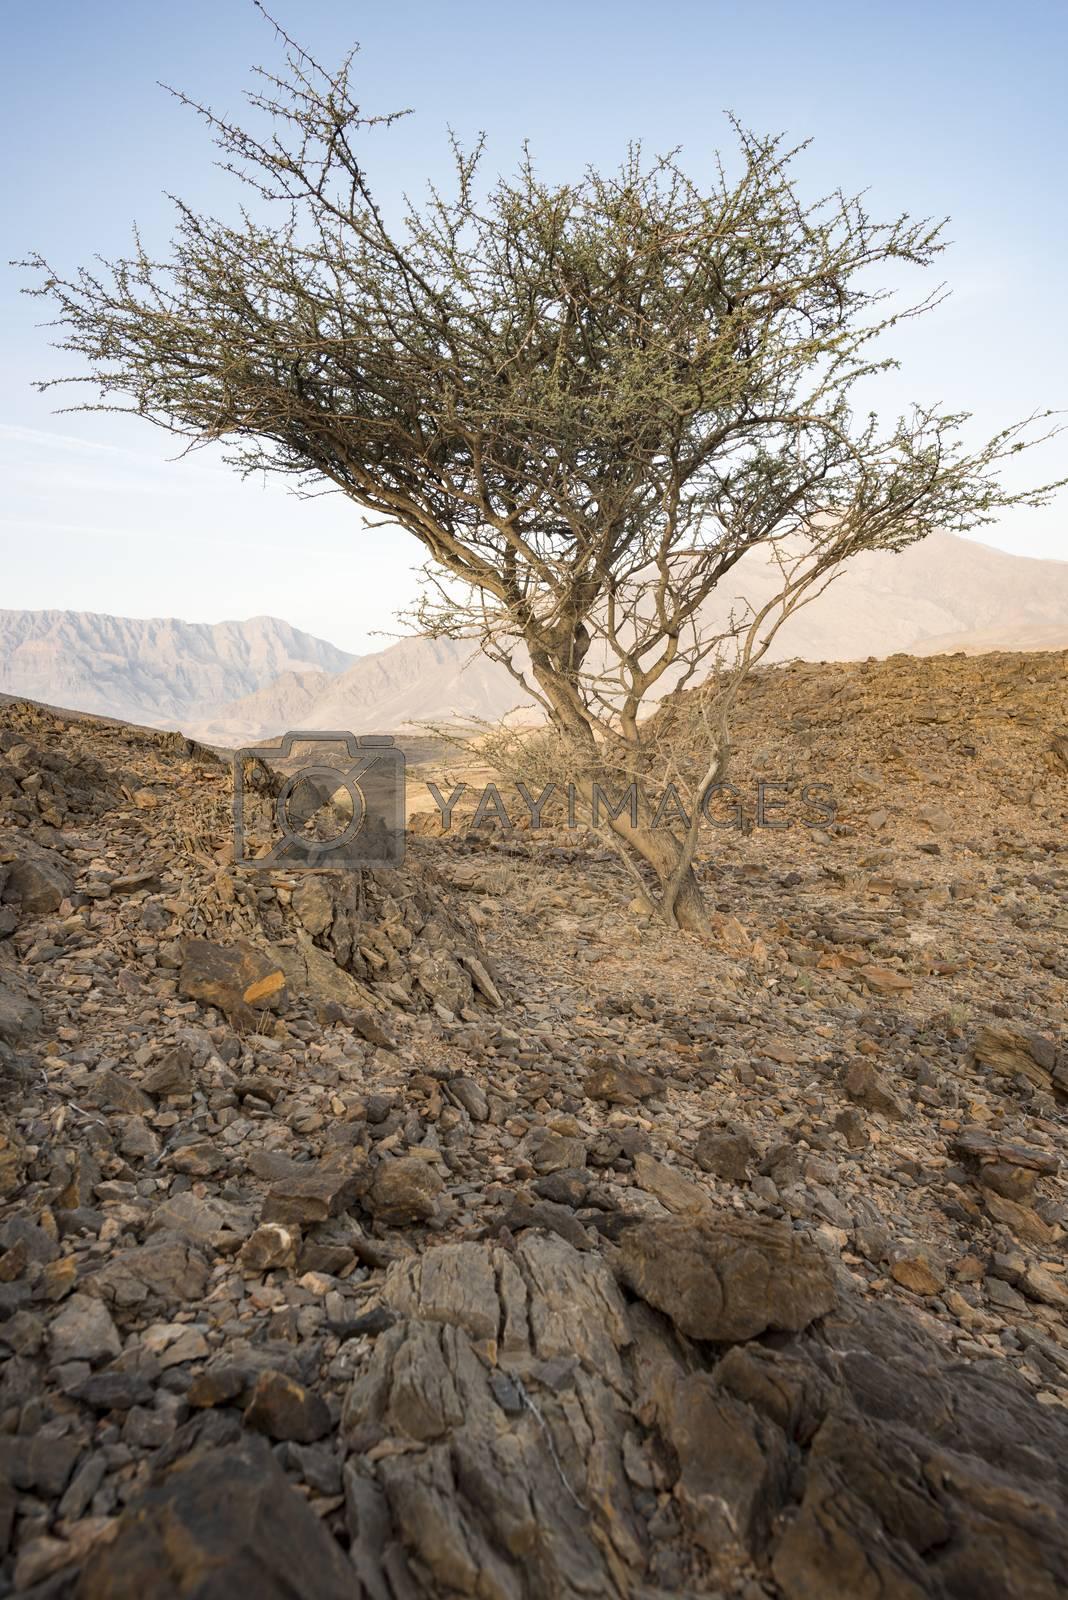 Acacia Tree between rocks in a Wadi near Wadi Dayqah Dam in the Sultanate of Oman.